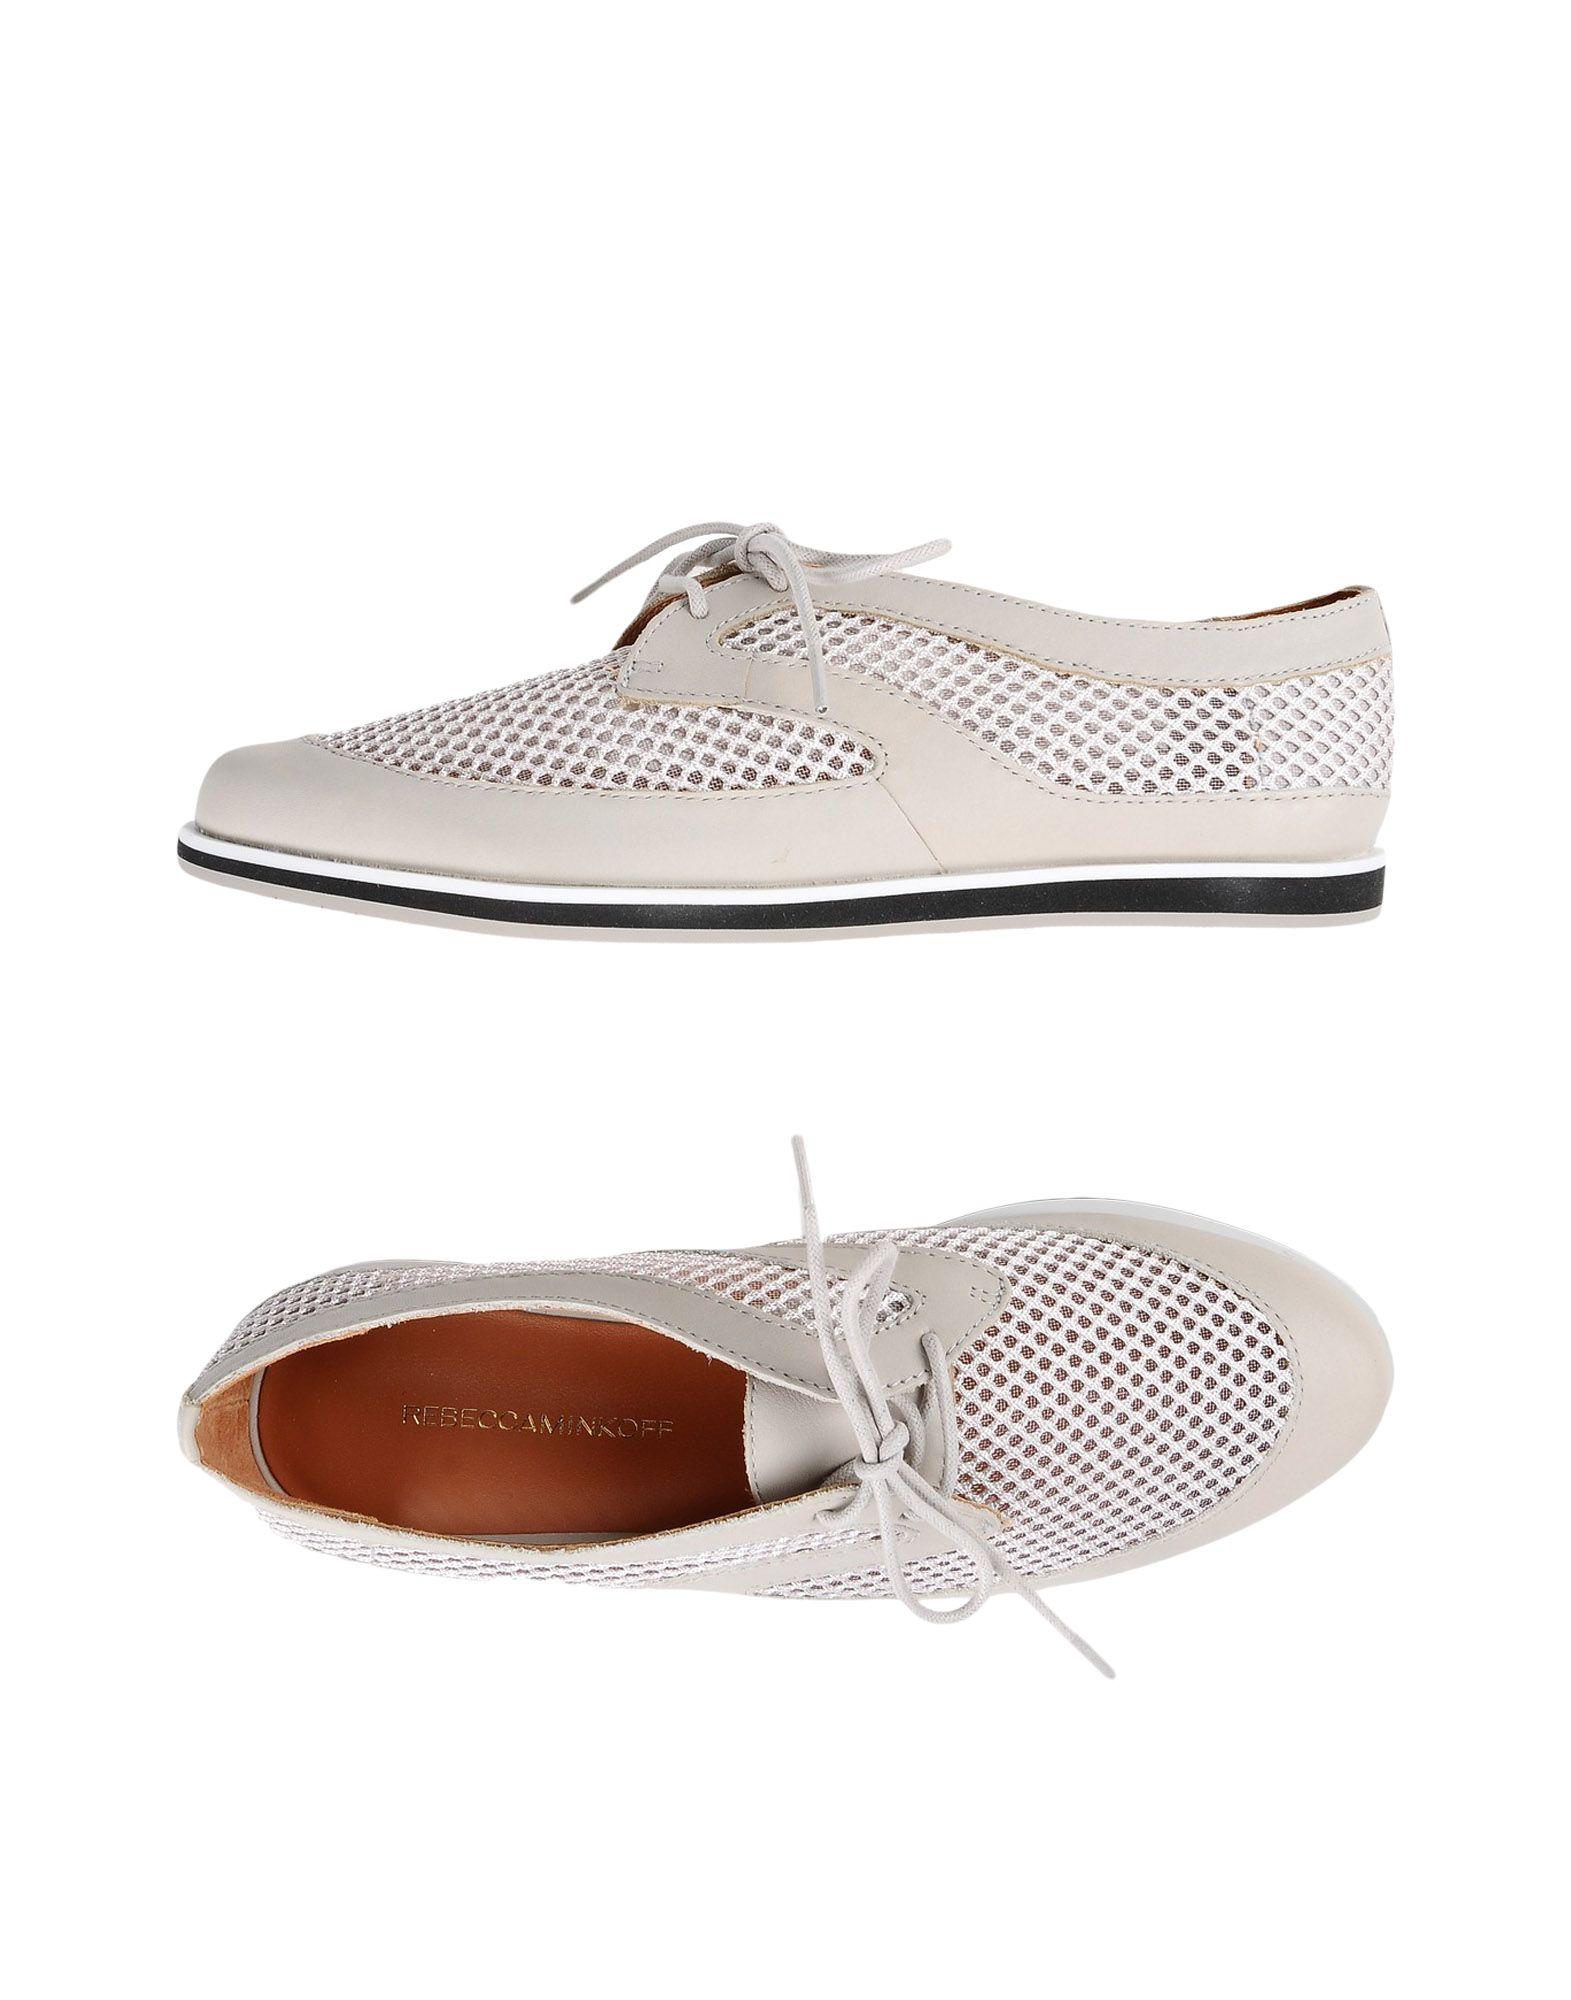 FOOTWEAR - Lace-up shoes on YOOX.COM Rebecca Minkoff R7Zq6